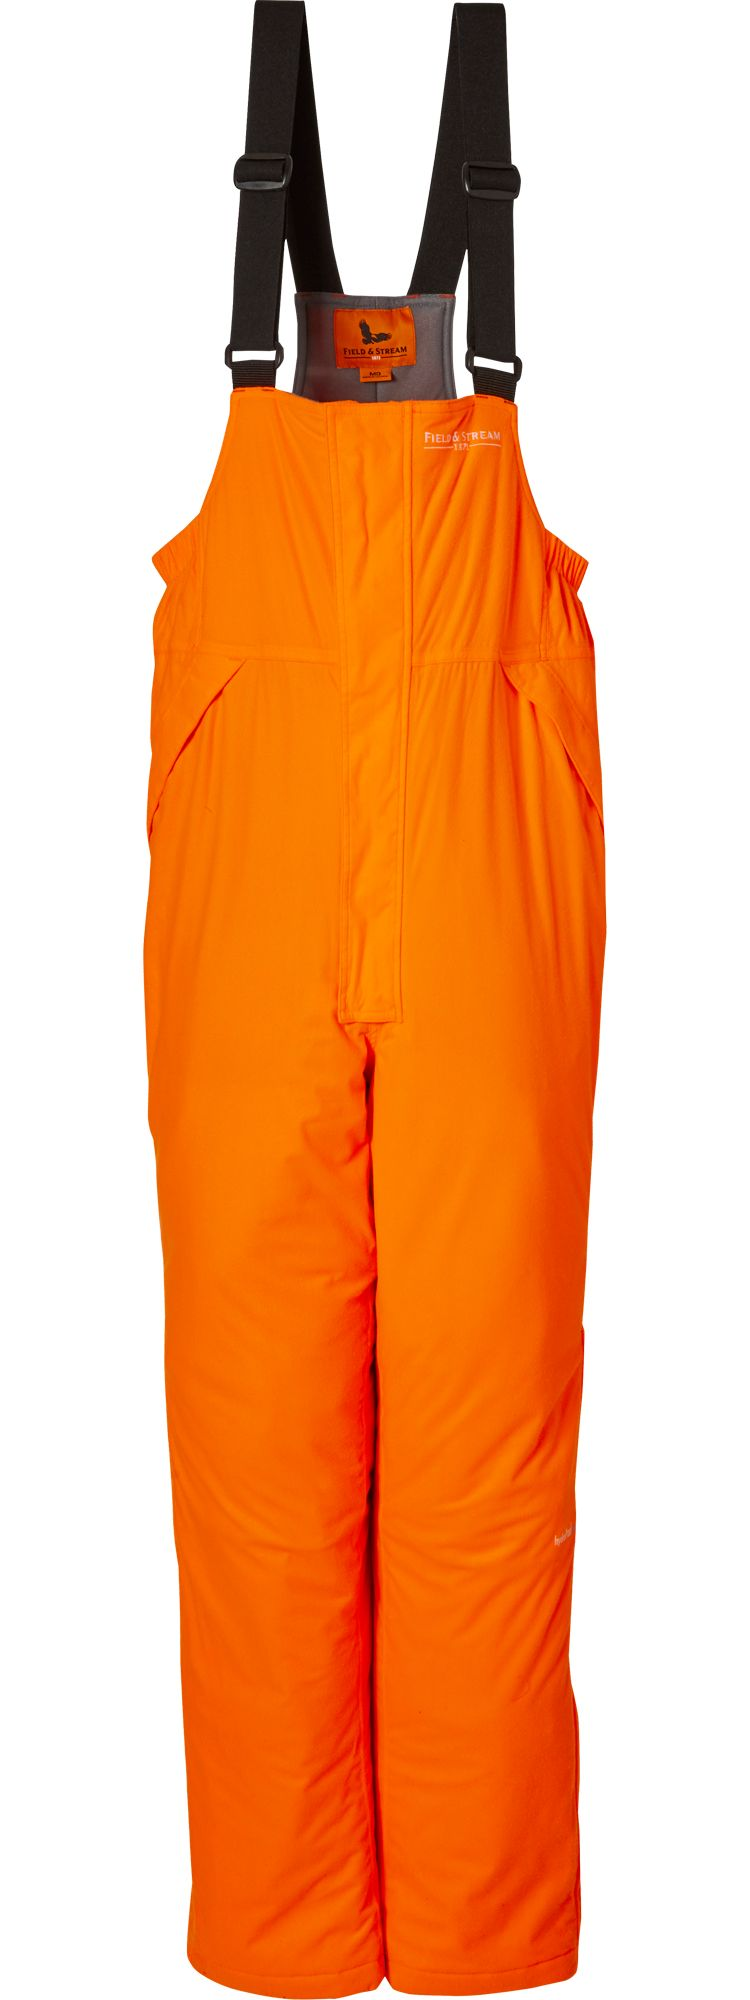 Field & Stream Men's True Pursuit Insulated Hunting Bibs, Medium, Blaze Orange